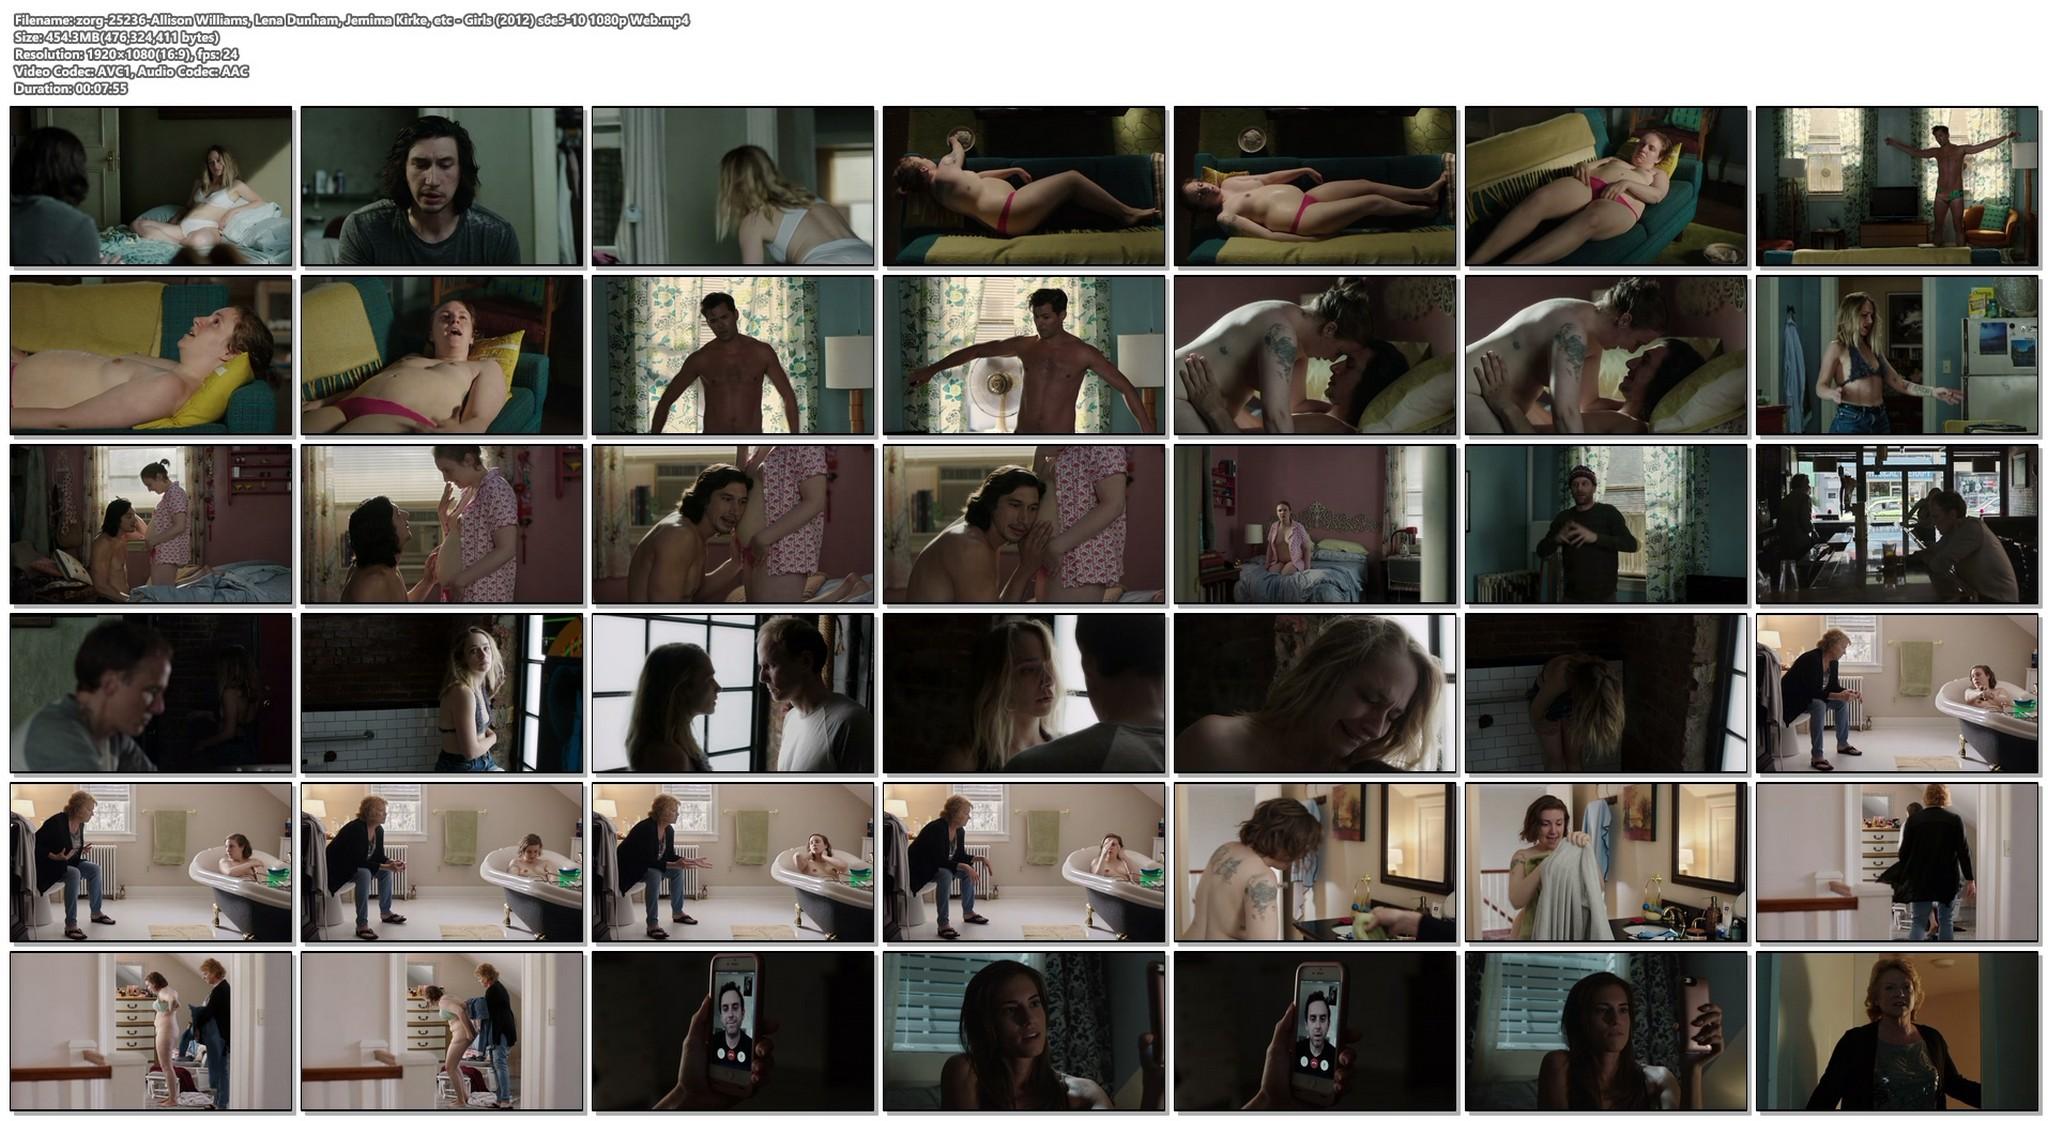 Lena Dunham nude bush Jemima Kirke nude Allison Williams sexy Girls 2012 s6e5 10 1080p Web 18